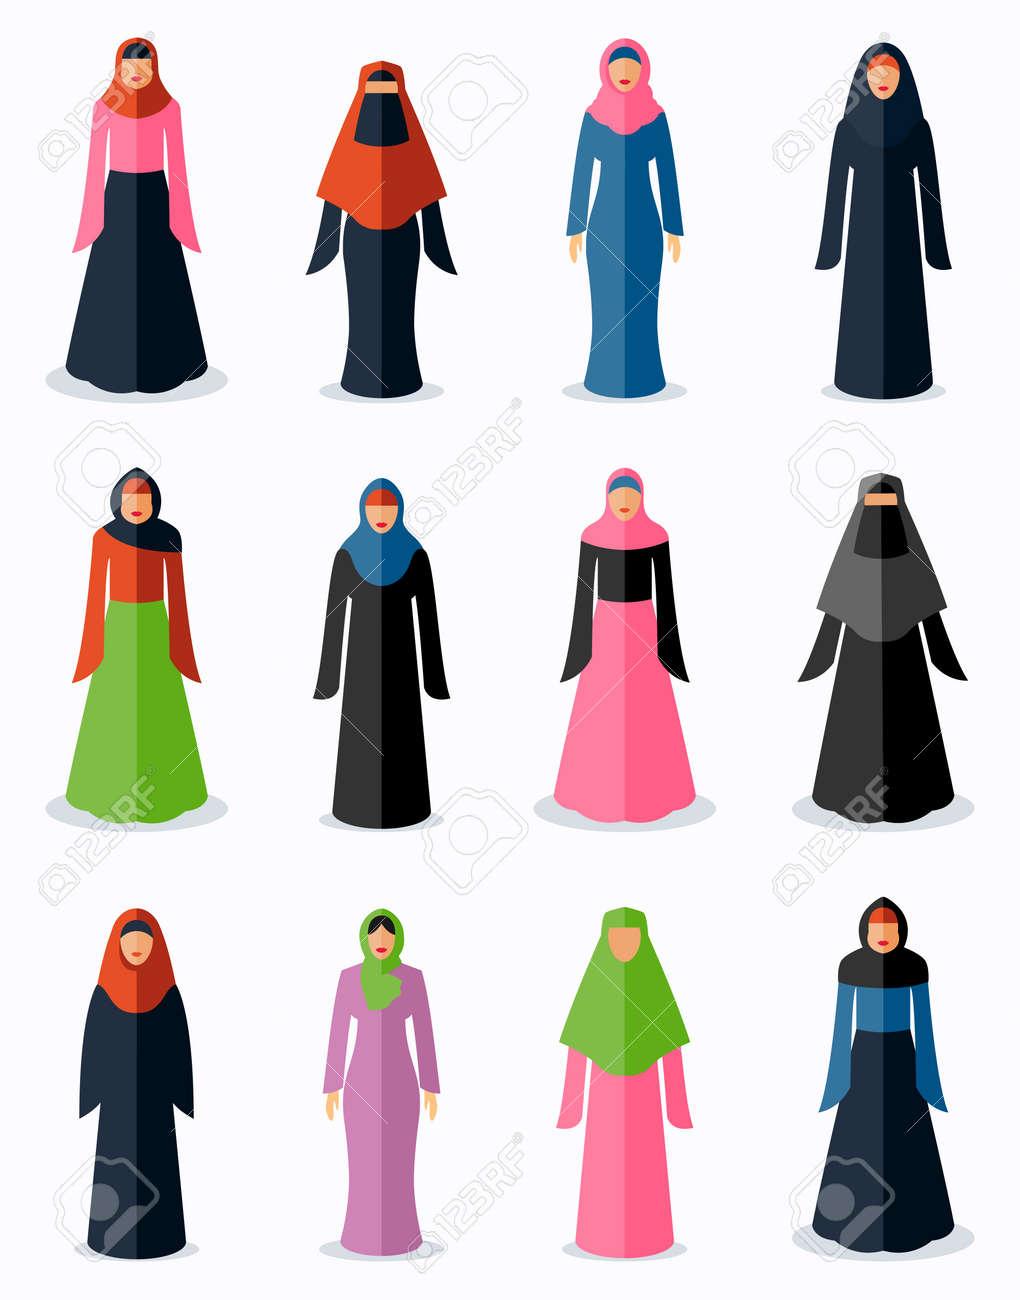 Muslim woman flat icons. Female traditional culture, arabic islam religion, vector illustration - 166718830